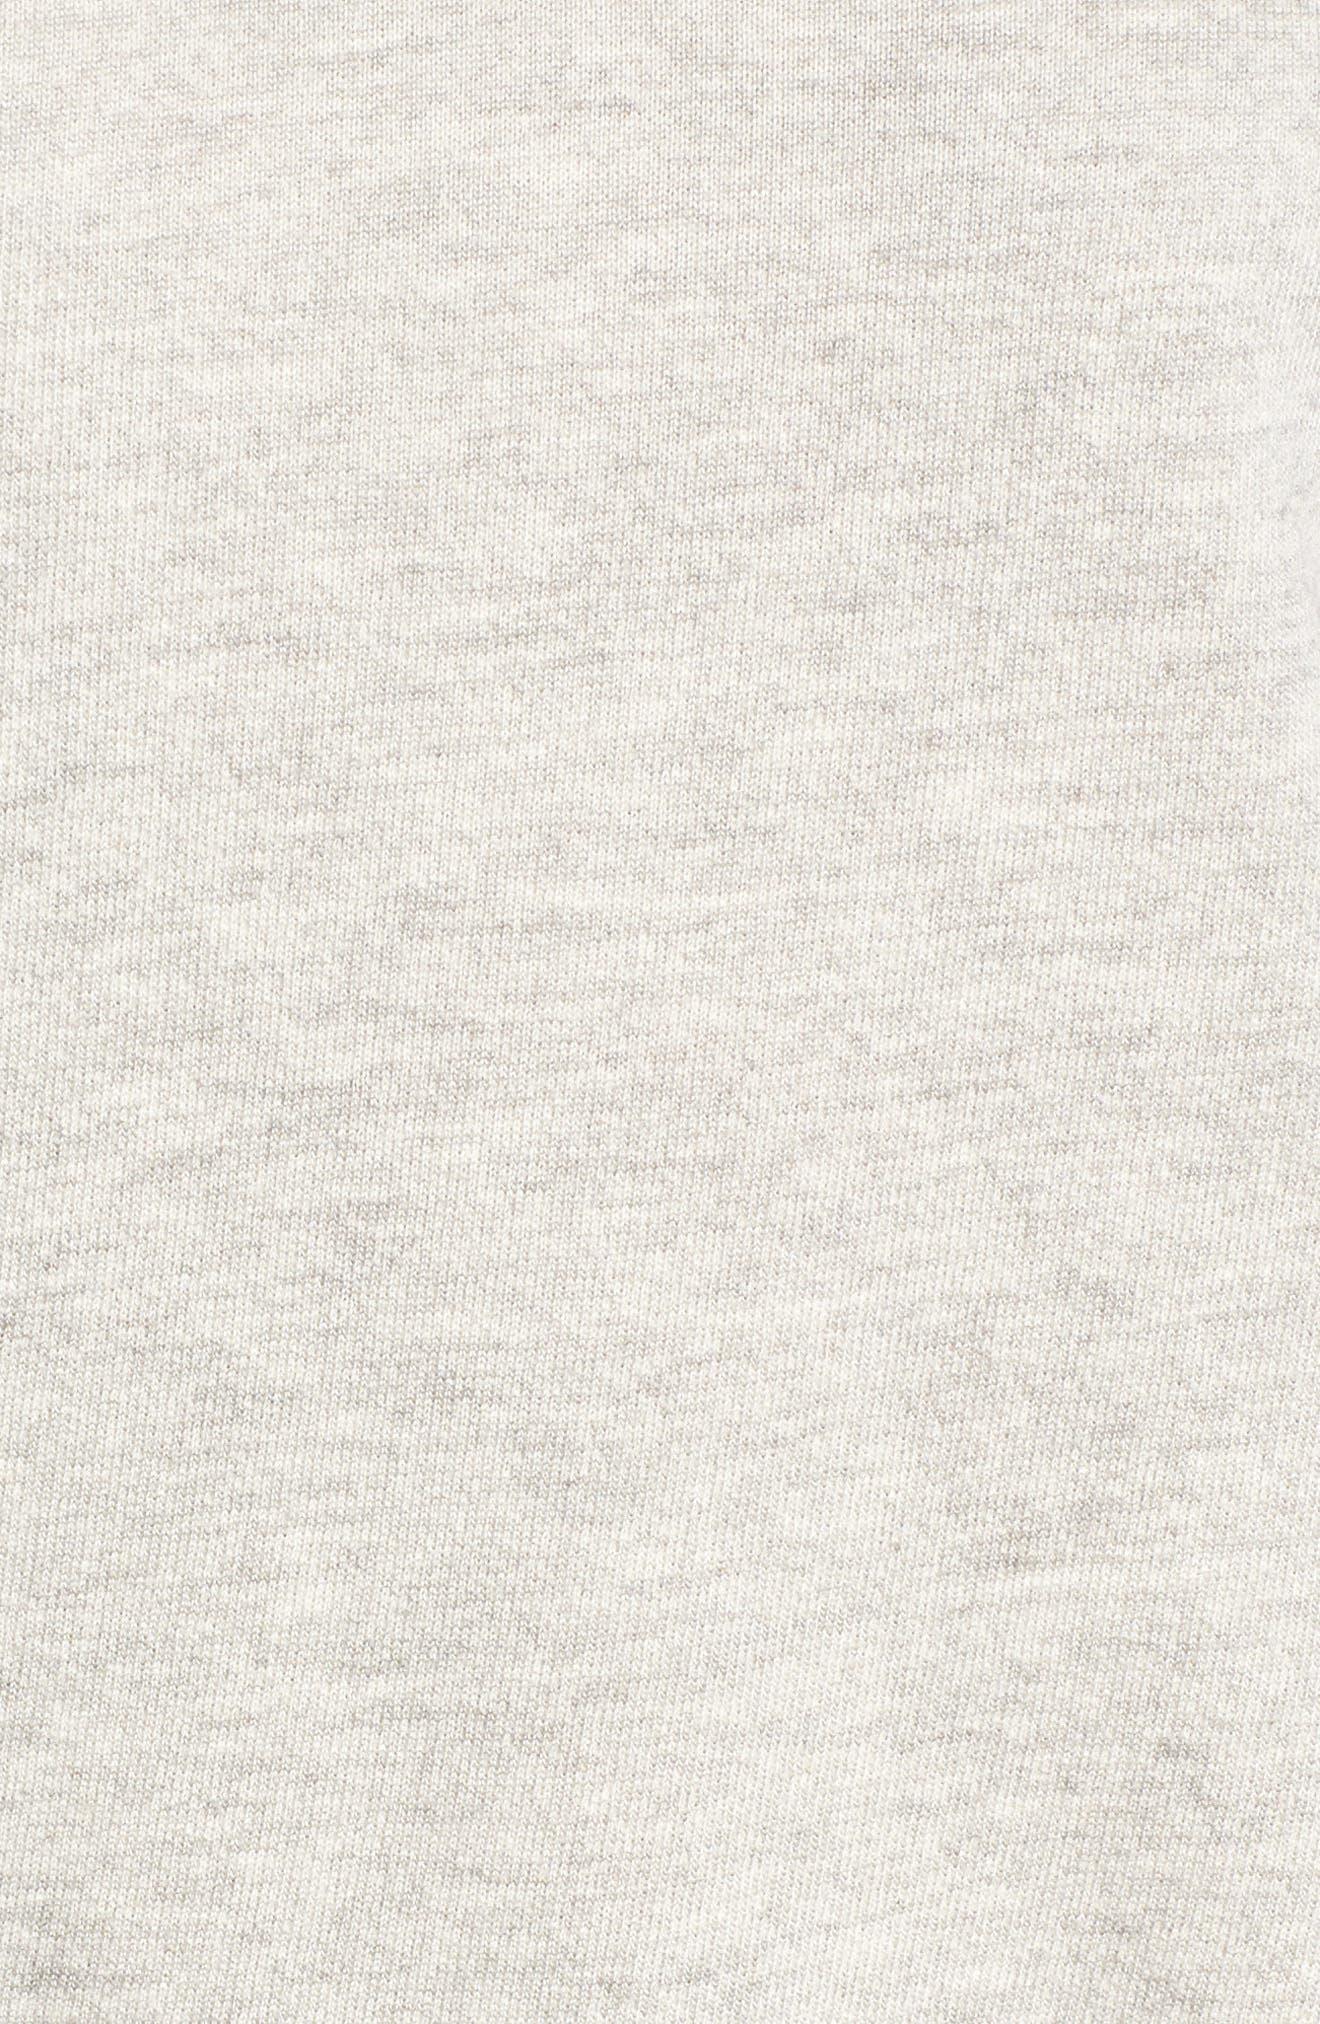 Ace Sweatshirt,                             Alternate thumbnail 5, color,                             030